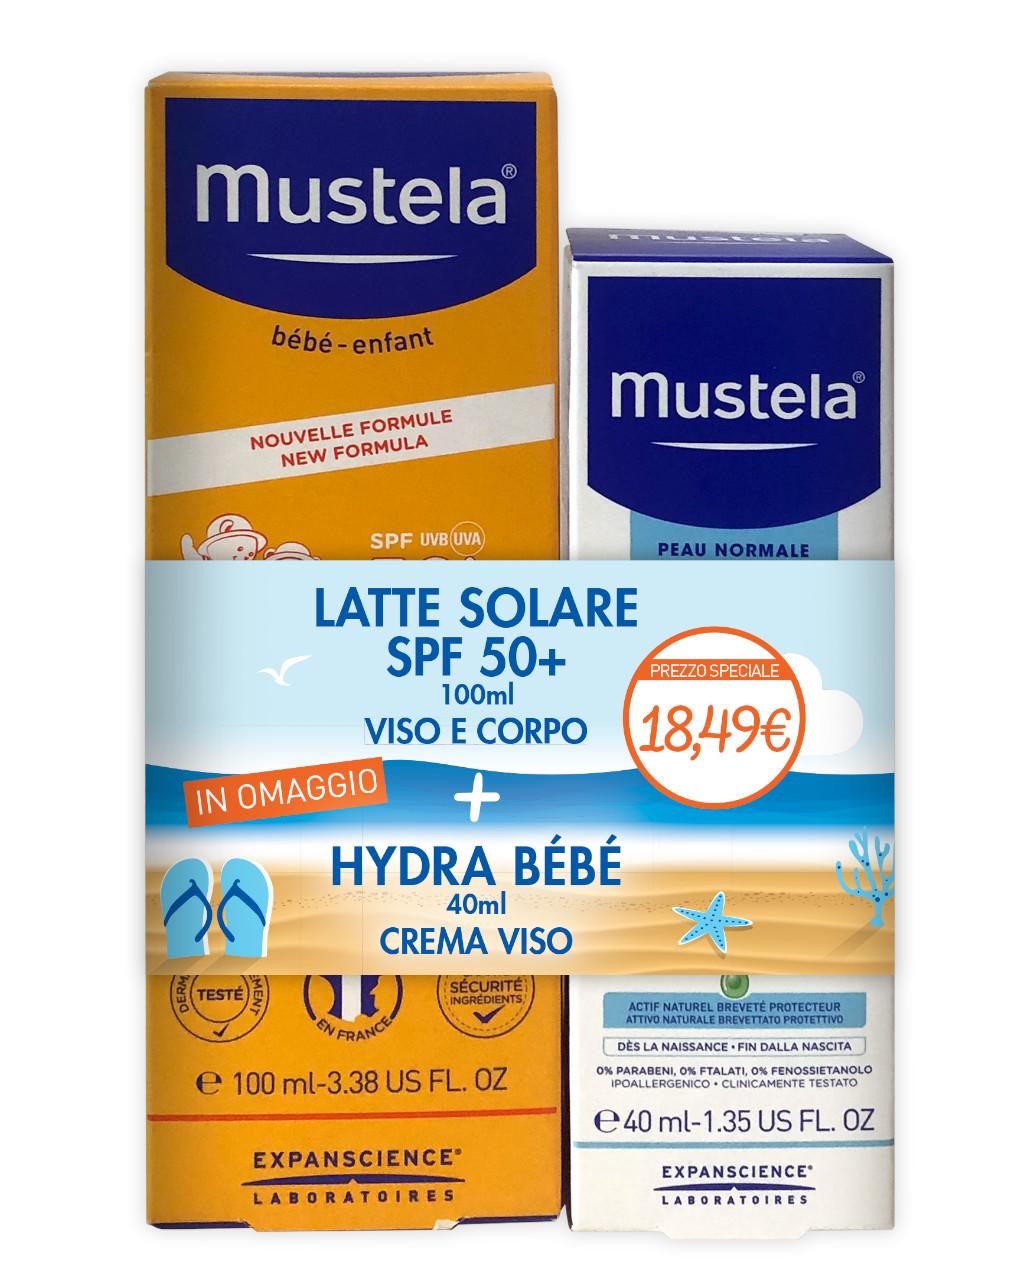 Latte solare spf50+ 100 ml + hydra bébé crema viso 40 ml - Mustela